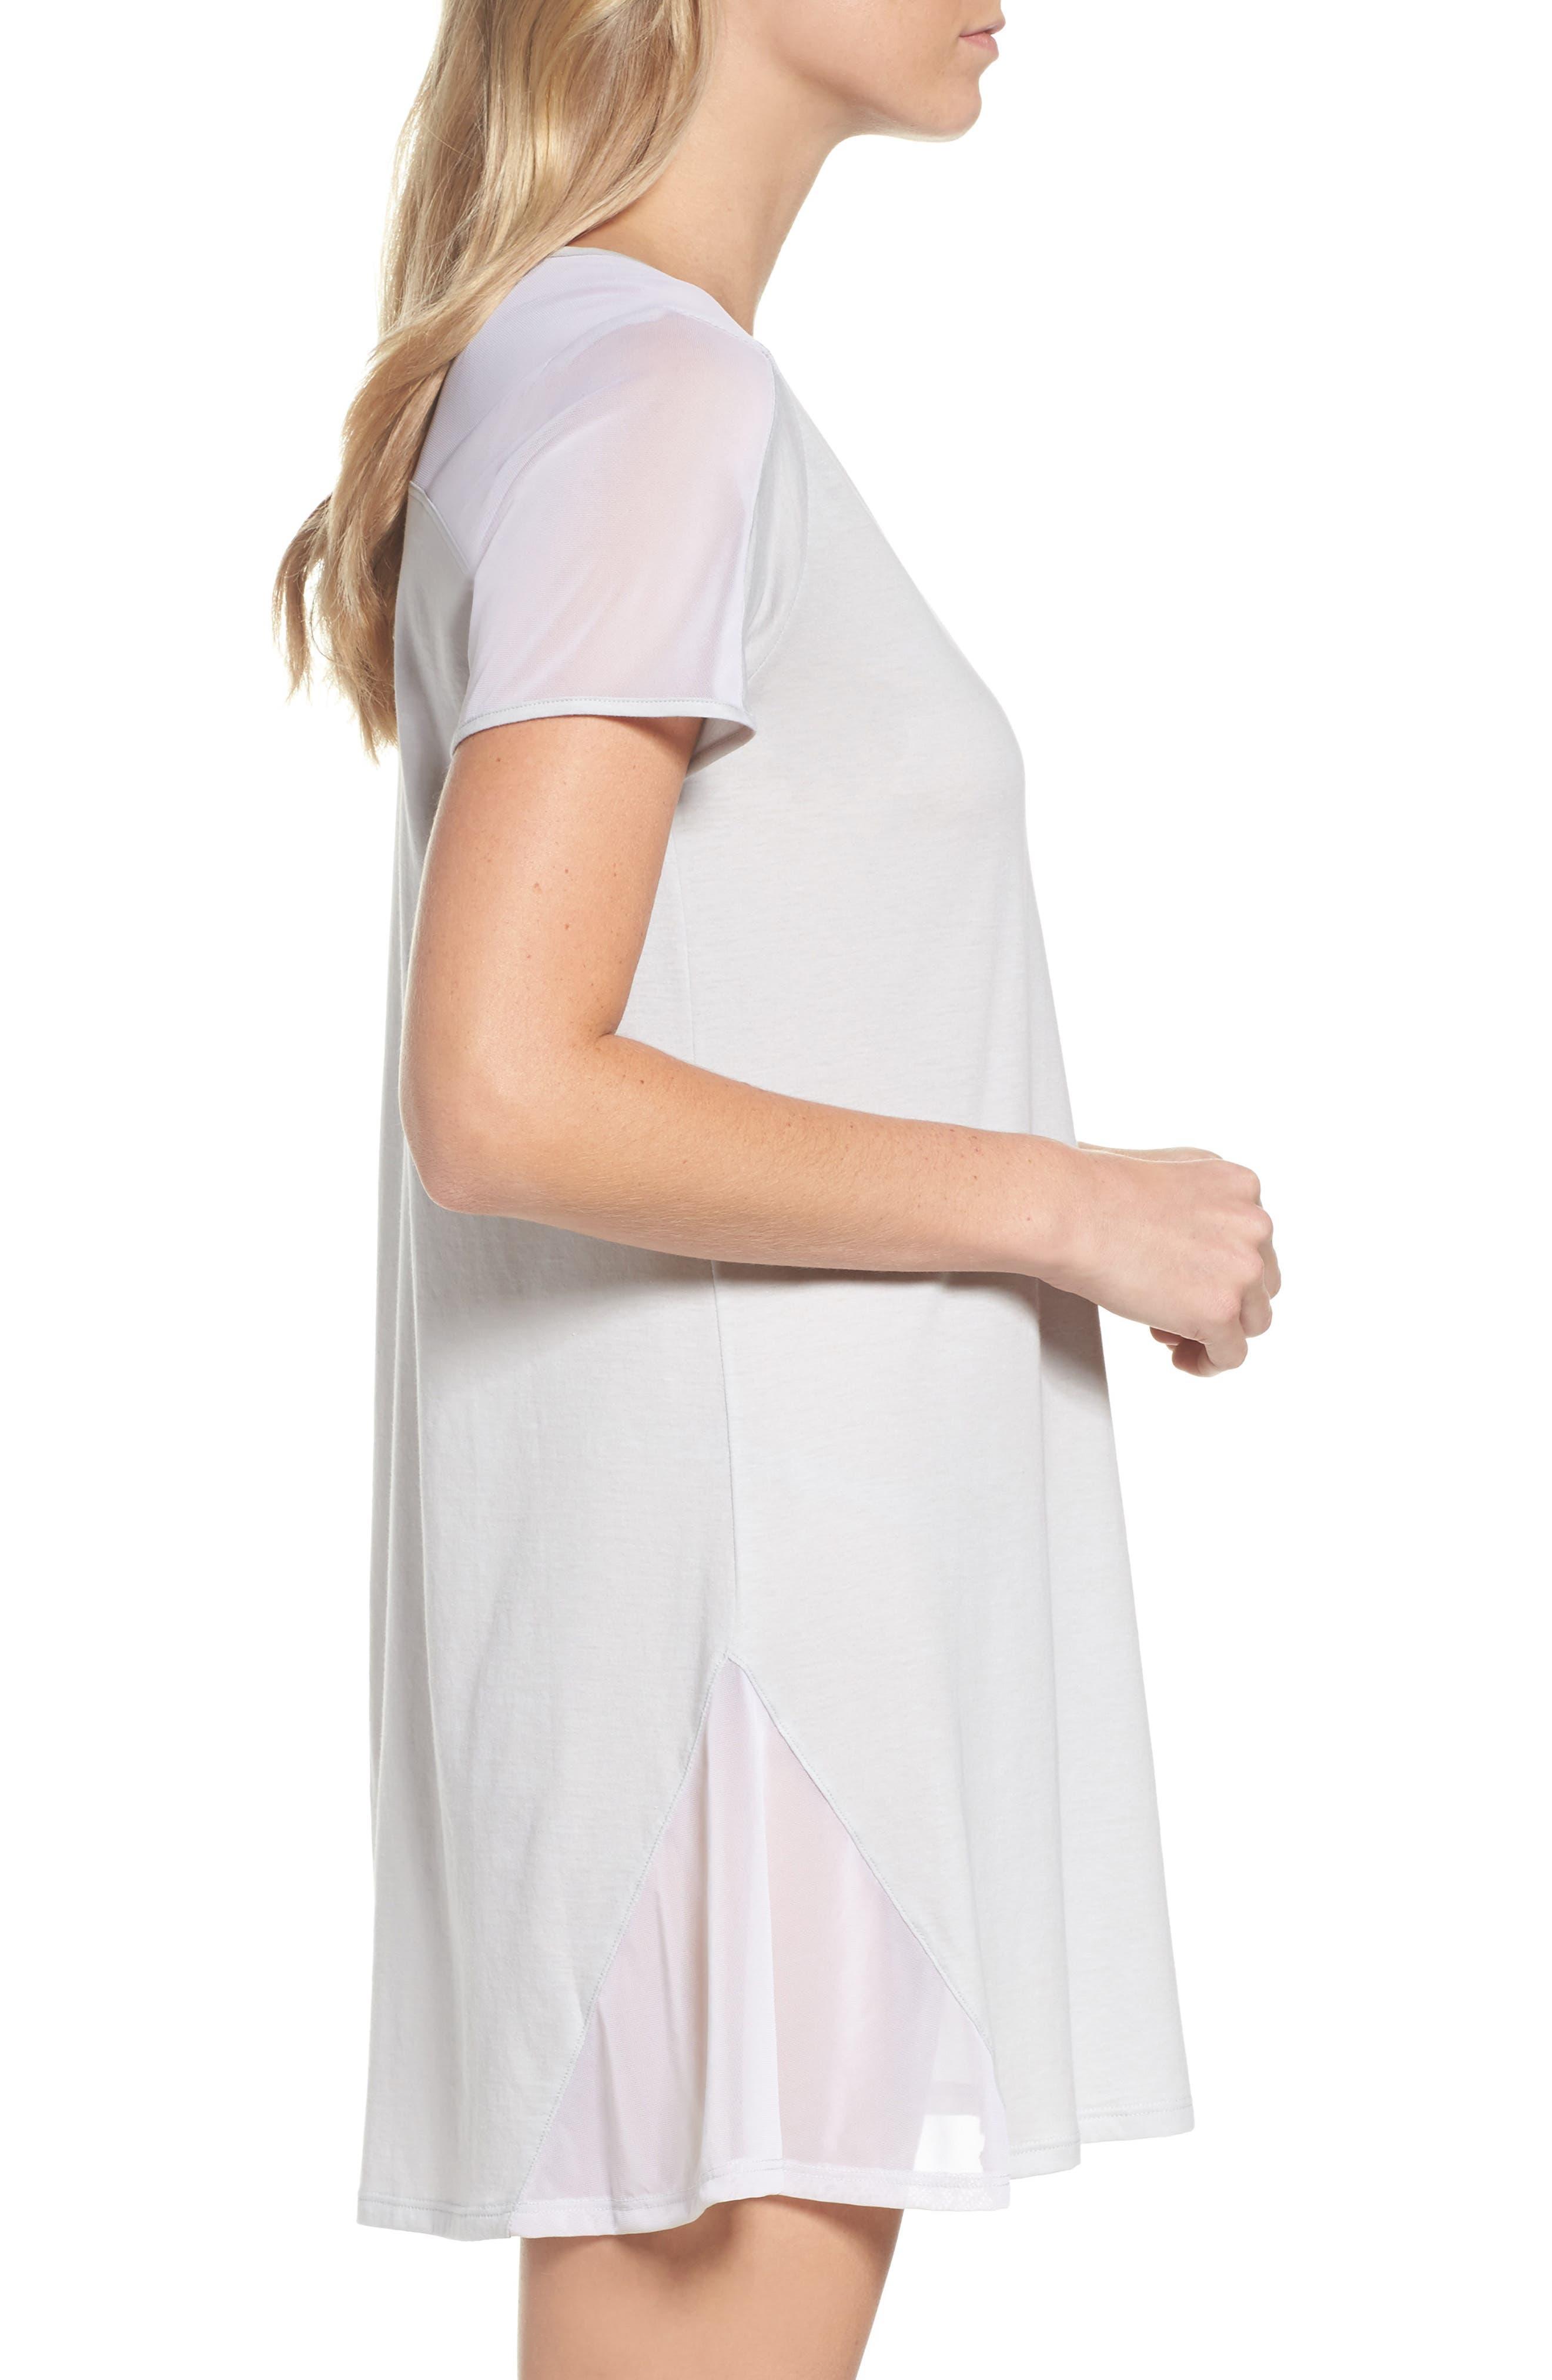 Cotton Sleep Shirt,                             Alternate thumbnail 3, color,                             SOFT GRAY